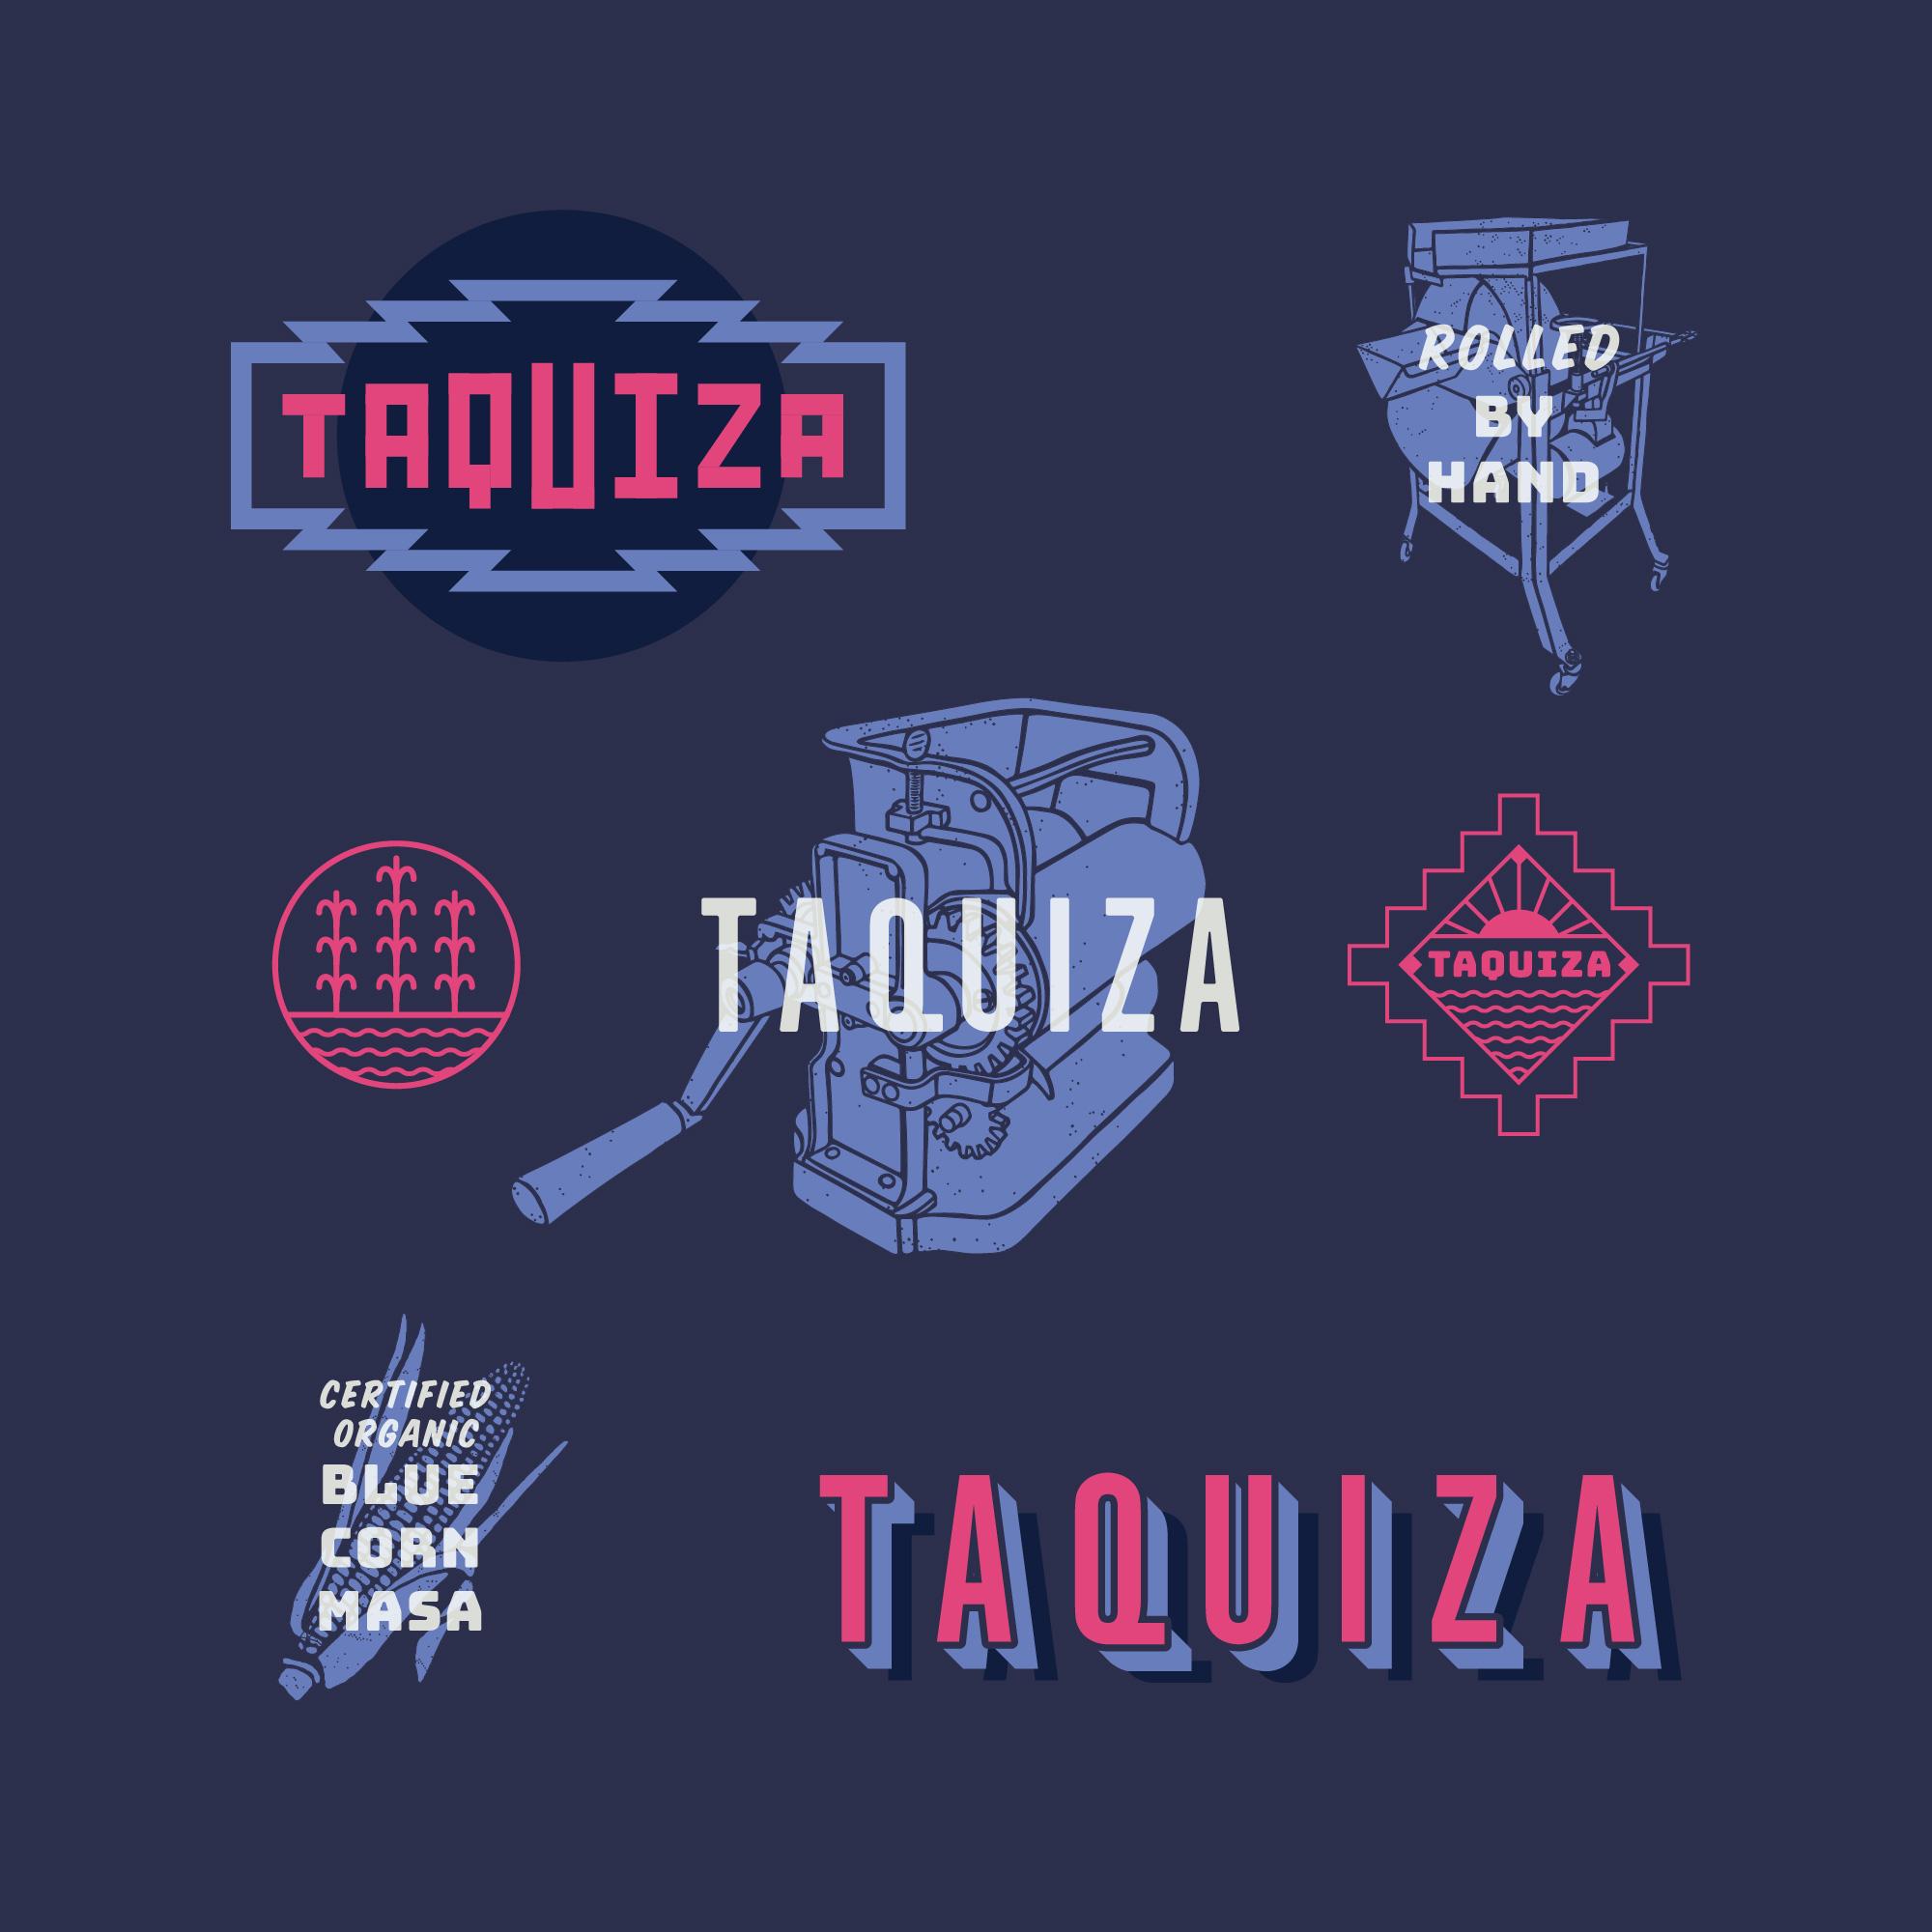 omit-studios-miami-taquiza-tacos-branding-5.jpg